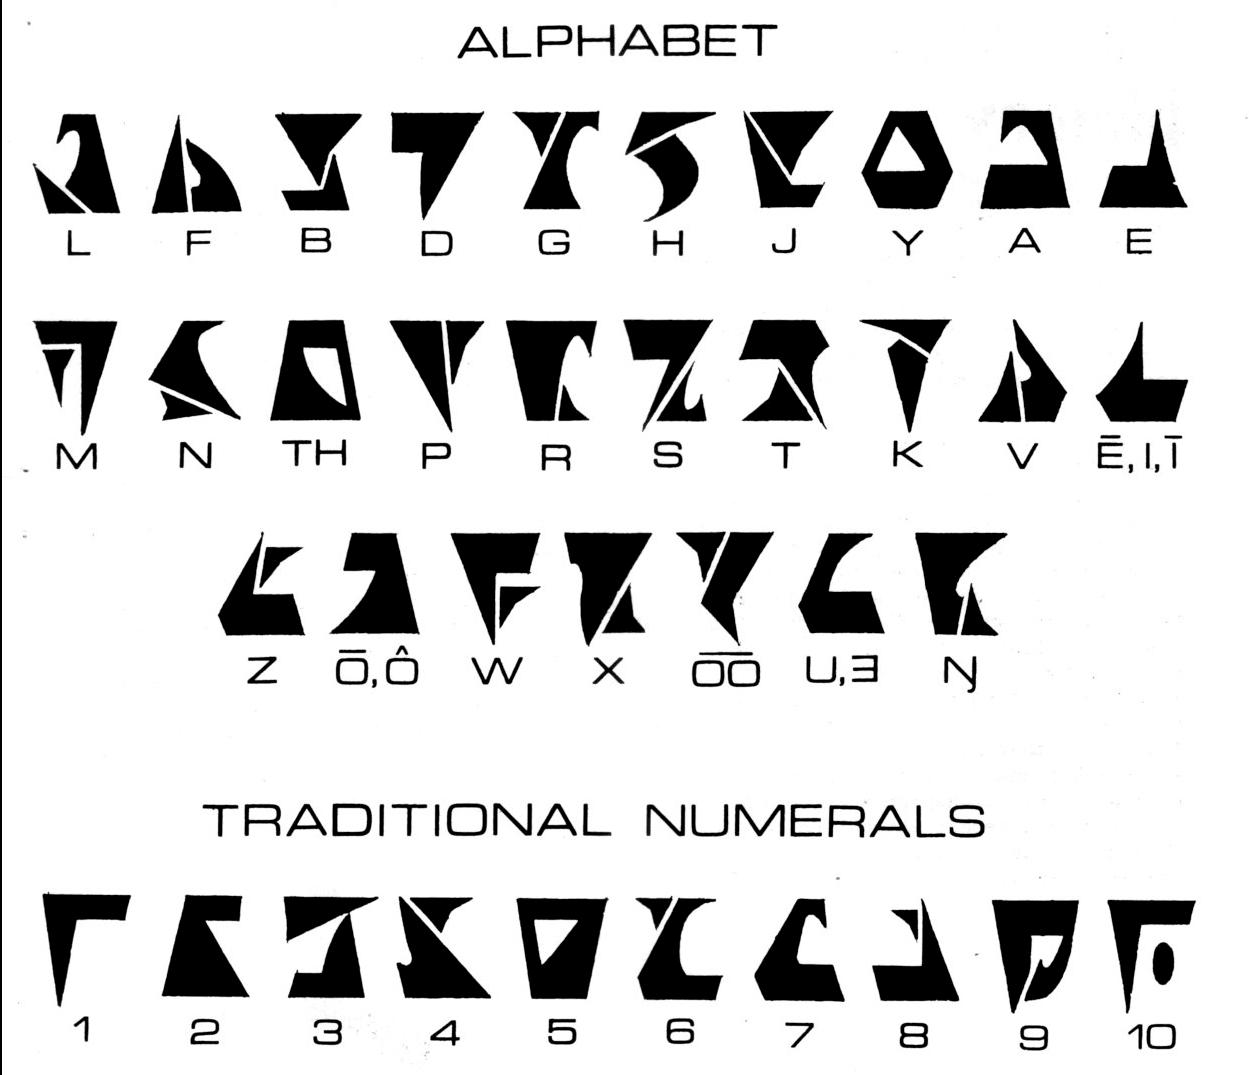 Klingonisch Translator